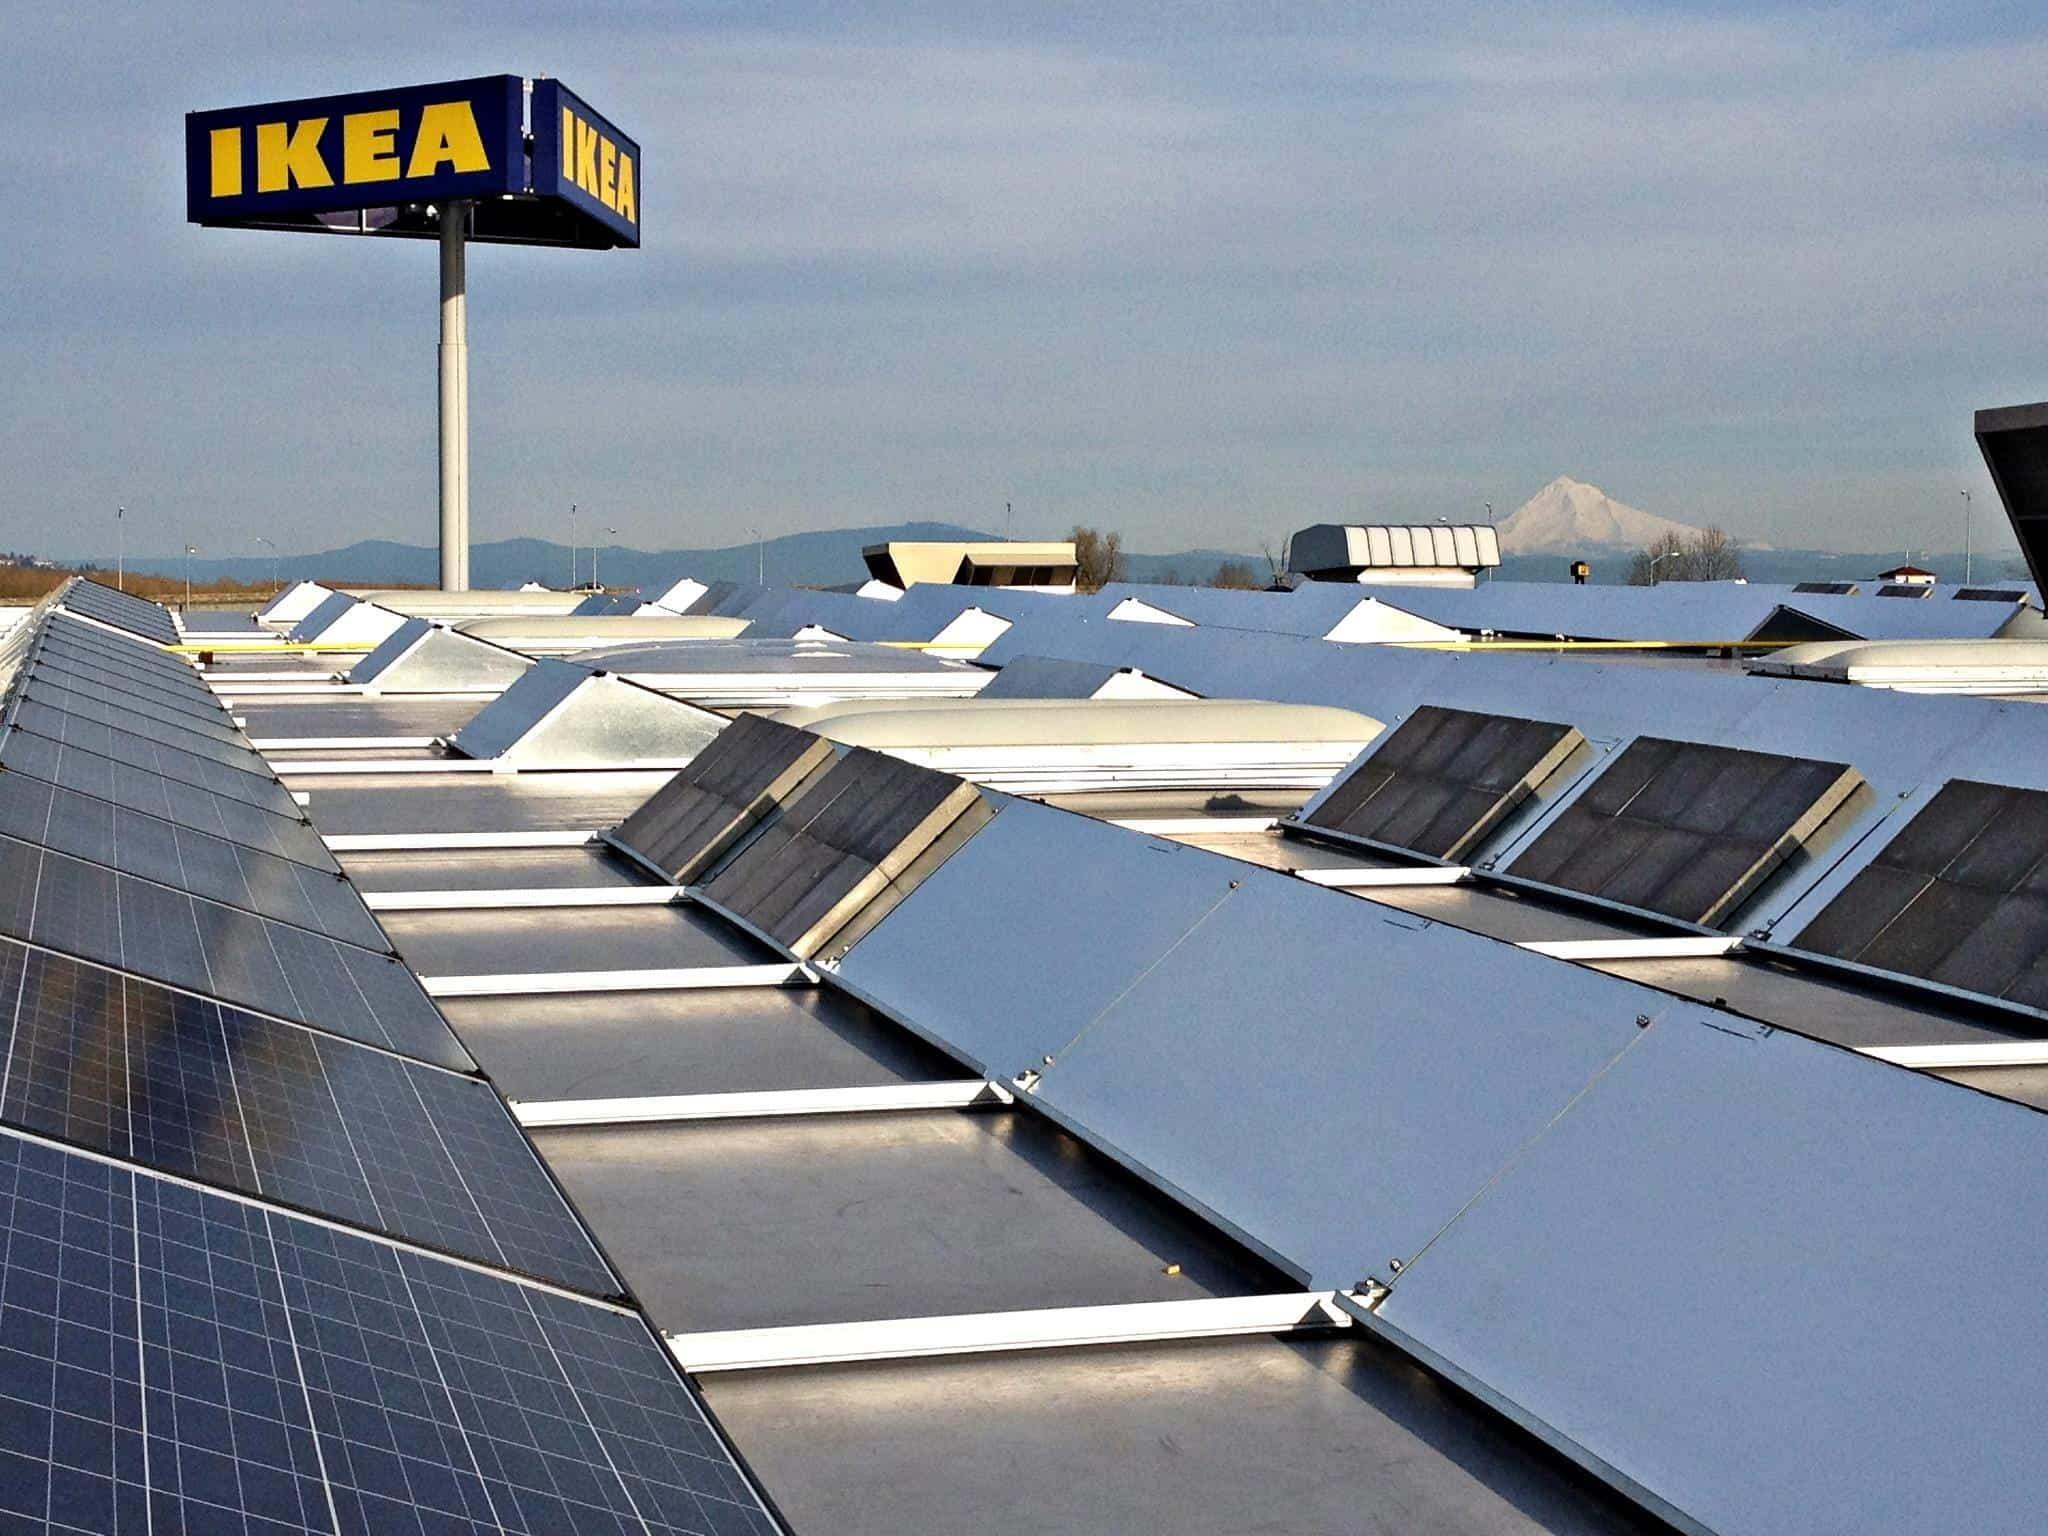 ikea paneles solares